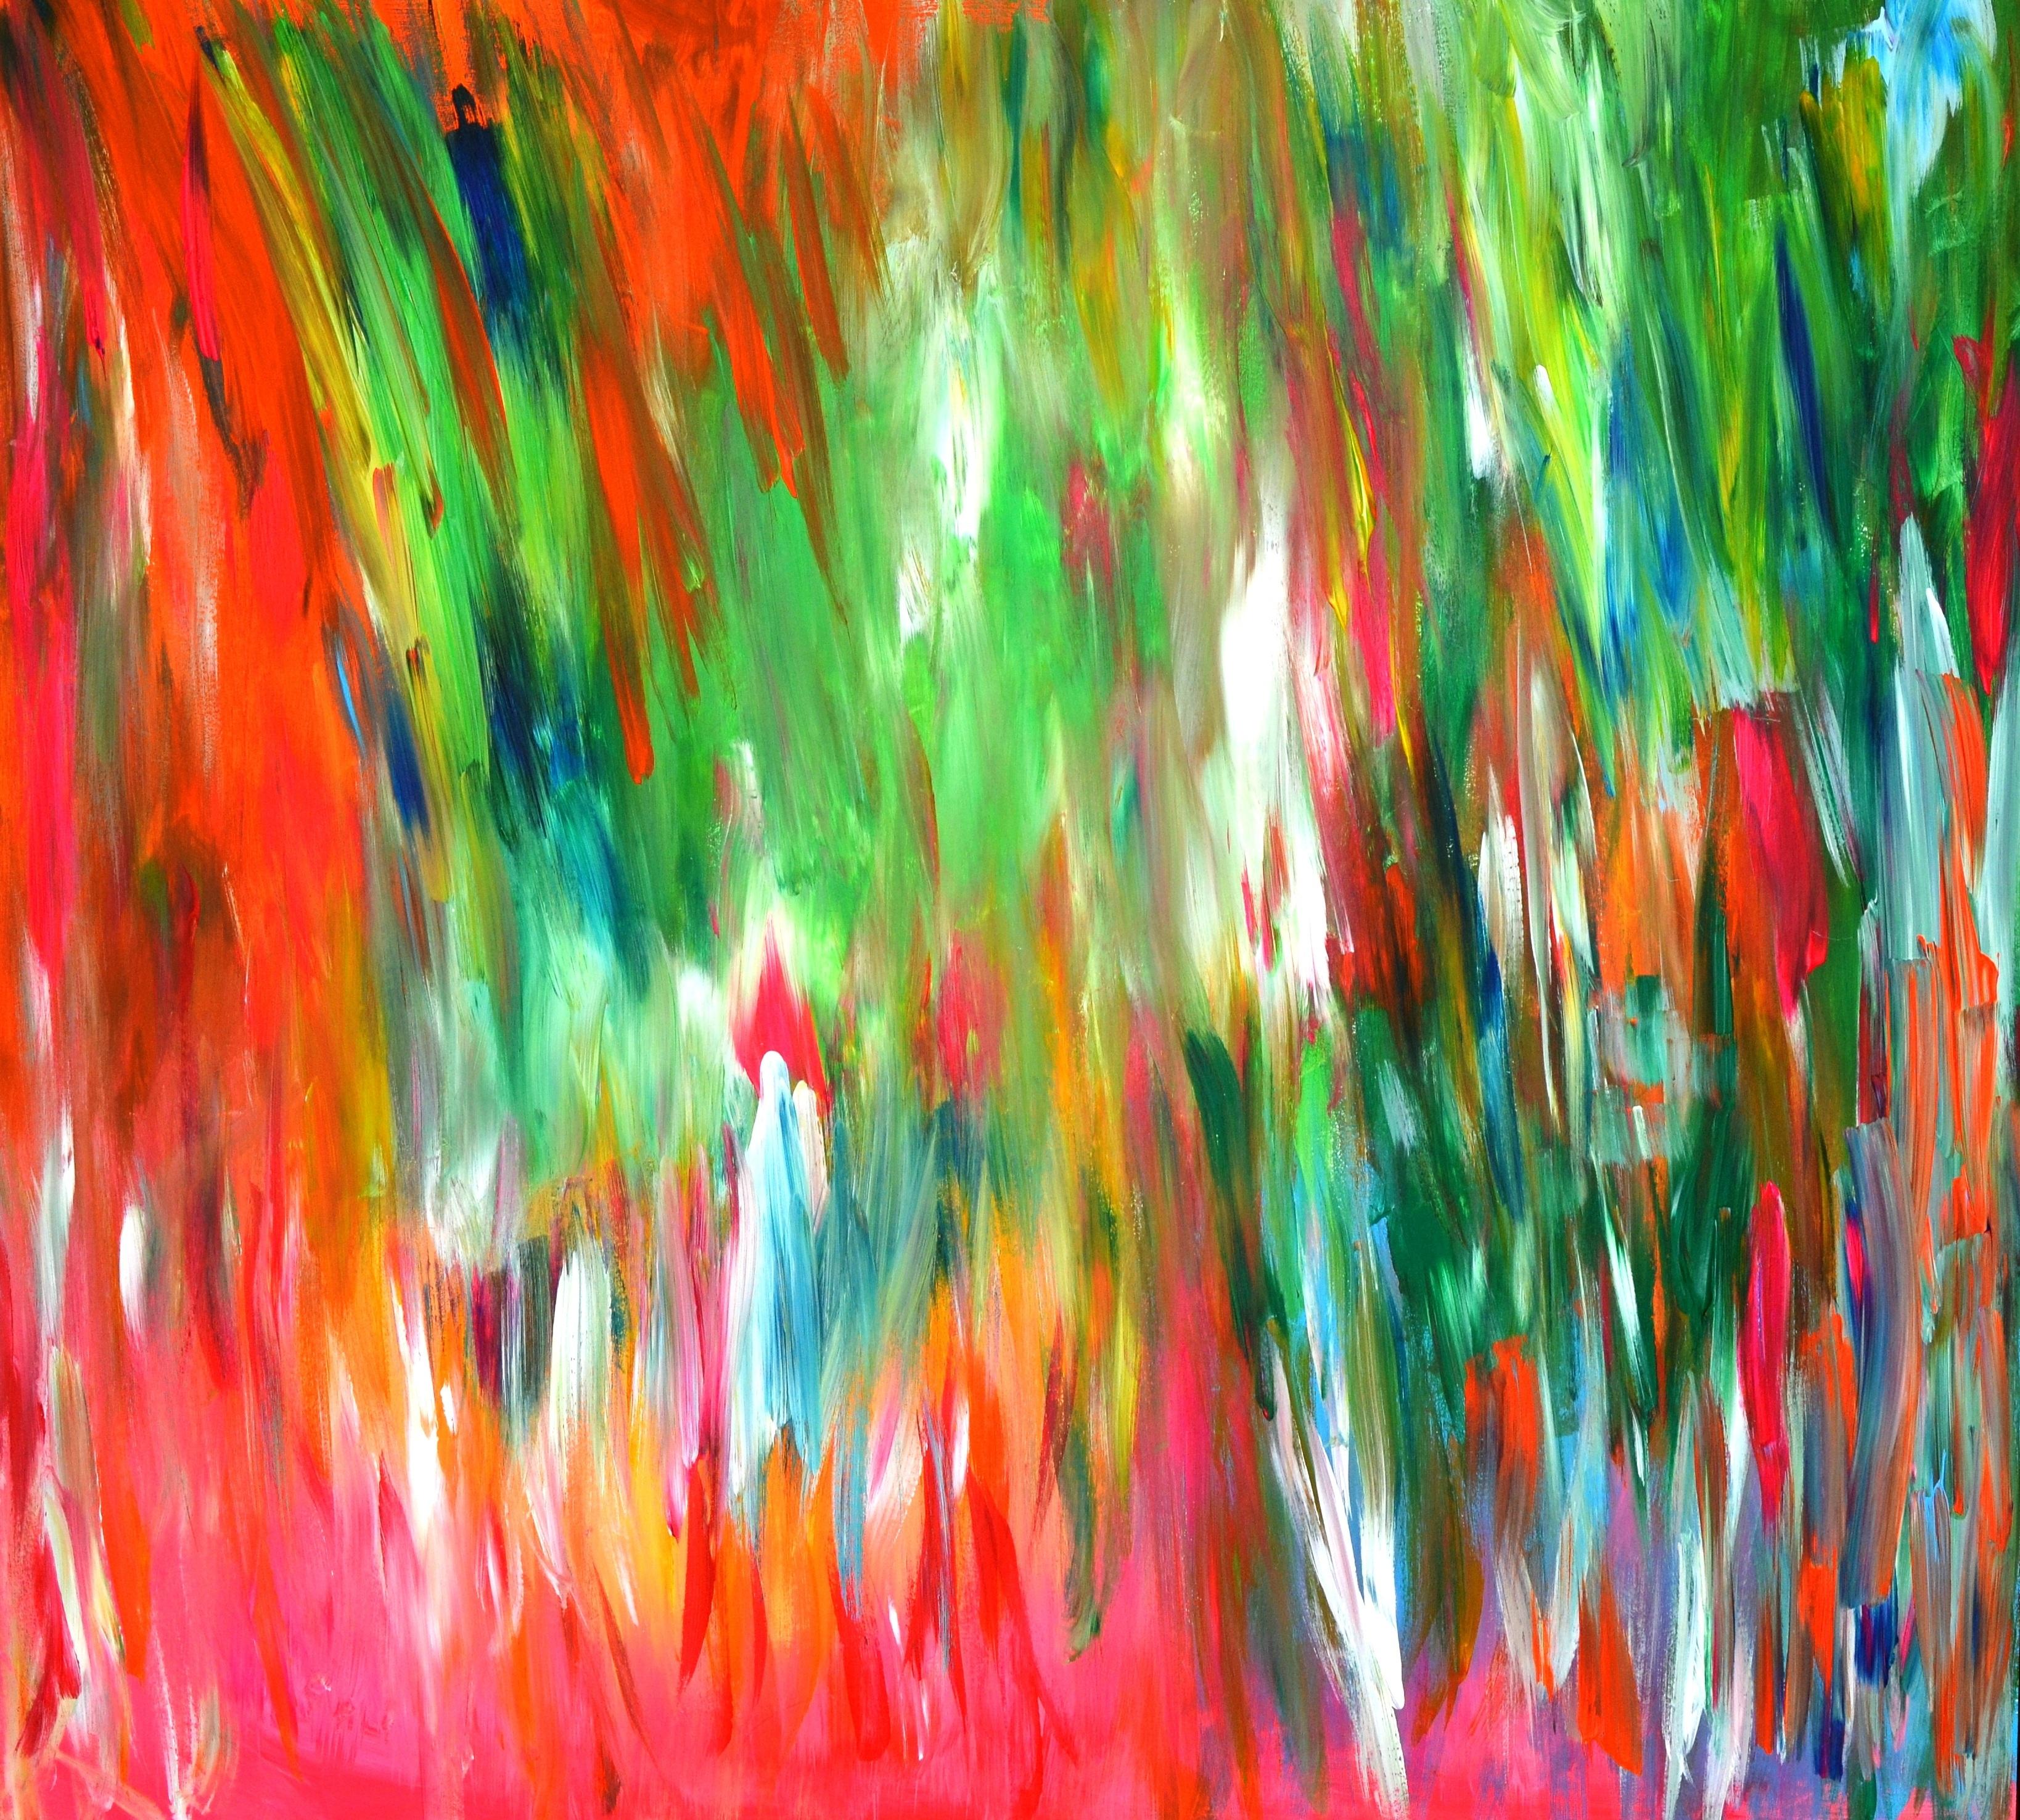 brazilian-modern-art-original-acrylic-painting-on-mdf-title-myopia-1340244865_org